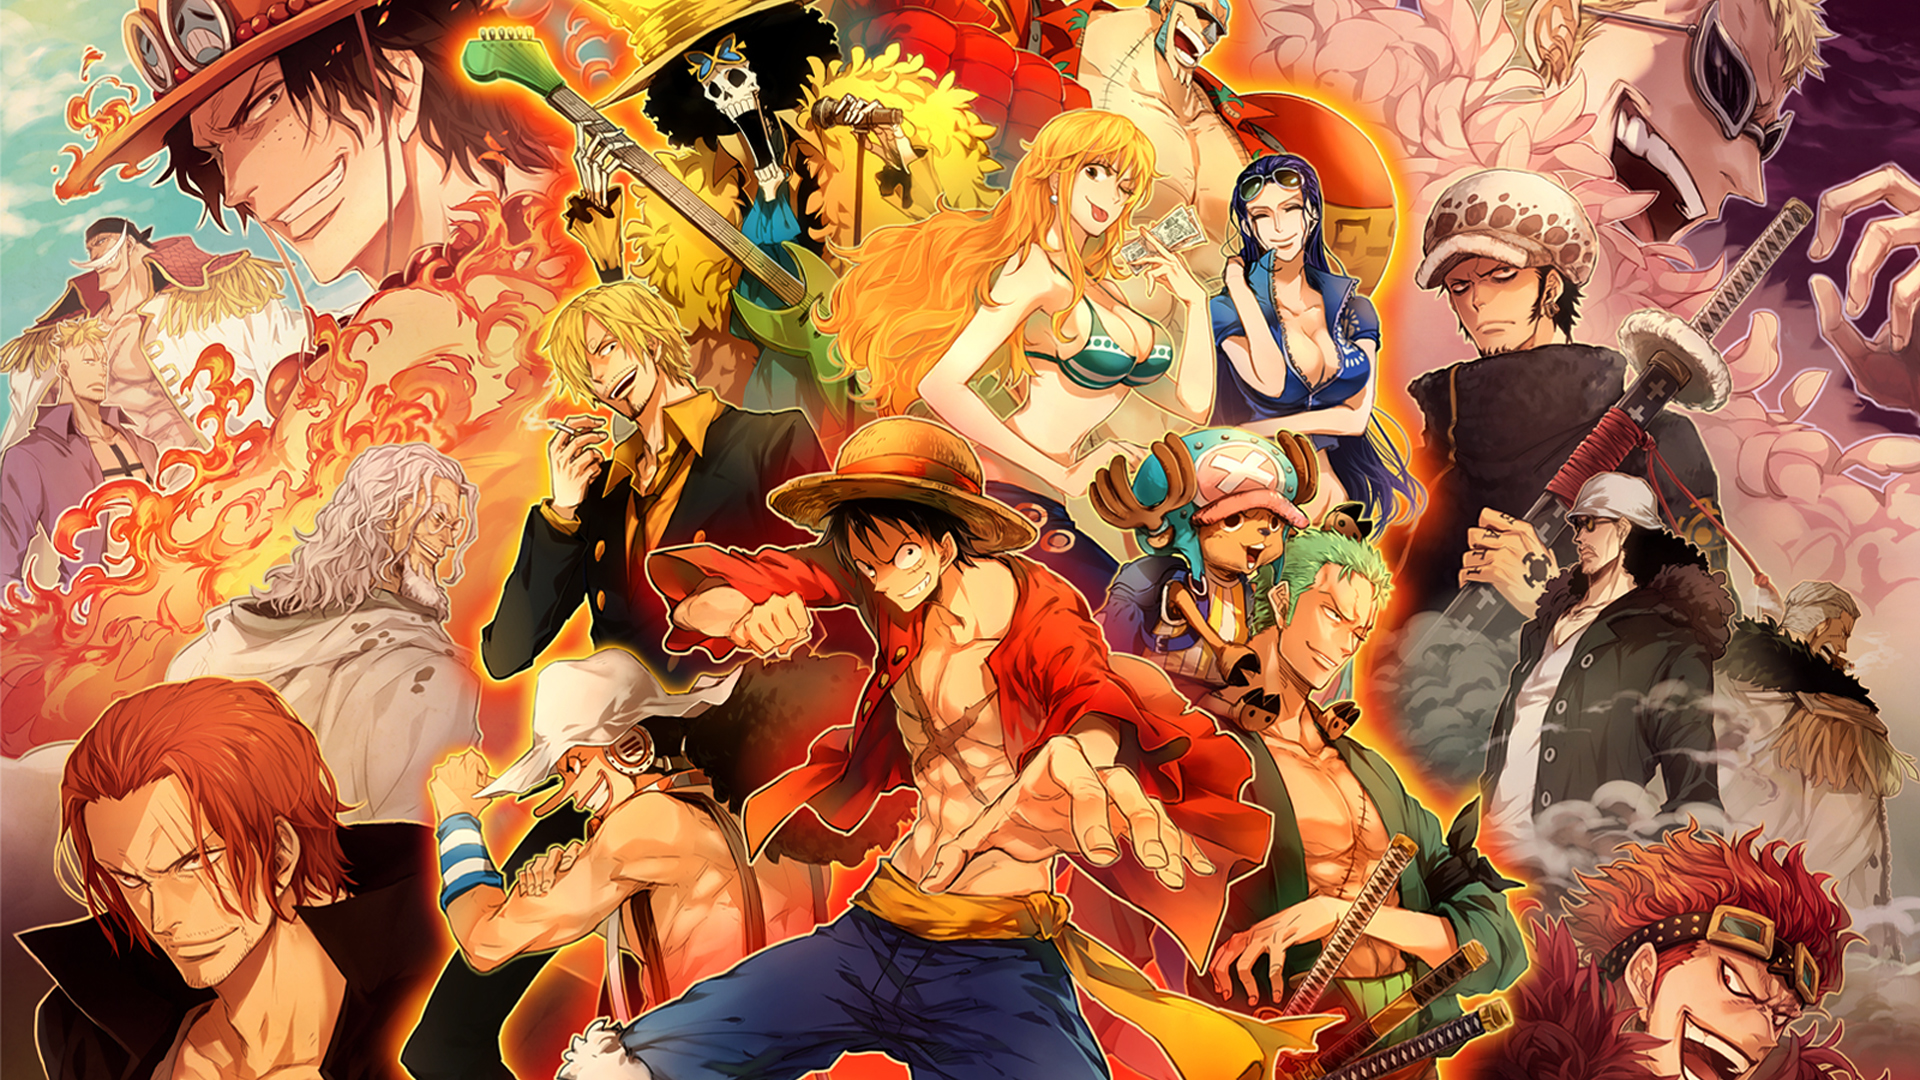 Anime-One-Piece-Shanks-Edward-Newgate-Portgas-D-Ace-Doflamingo-Trafalgar-Law-Usopp-Monkey-D-Luffy-wallpaper-wp3602561